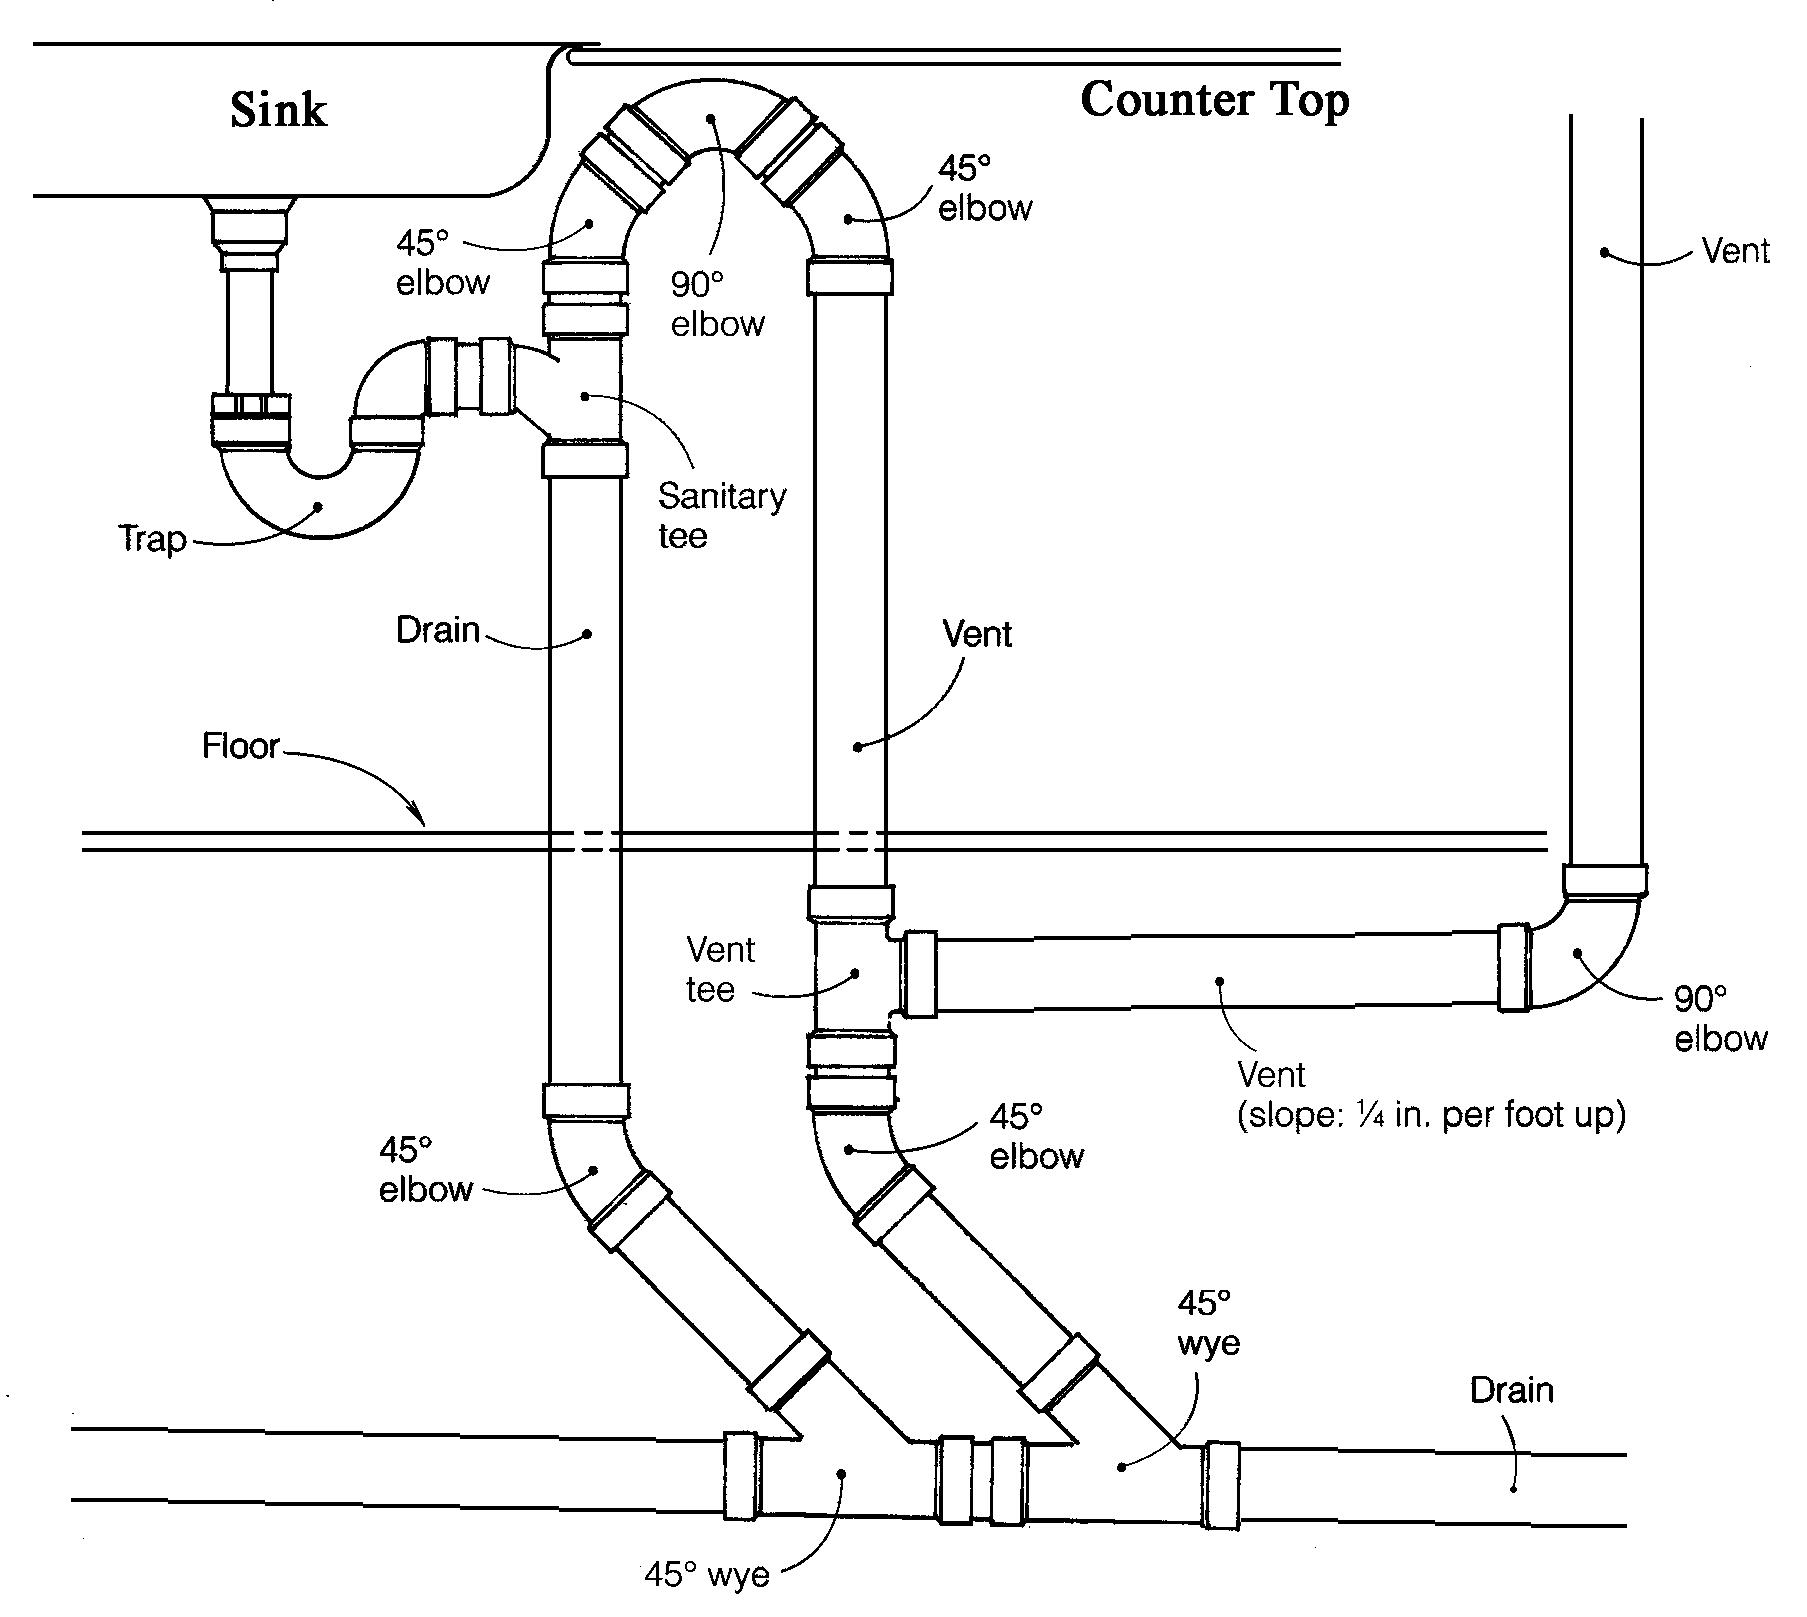 hight resolution of pluislandsink tiny house plumbing vent bathroom plumbing plumbing vent diagram tiny house plumbing pinterest plumbing